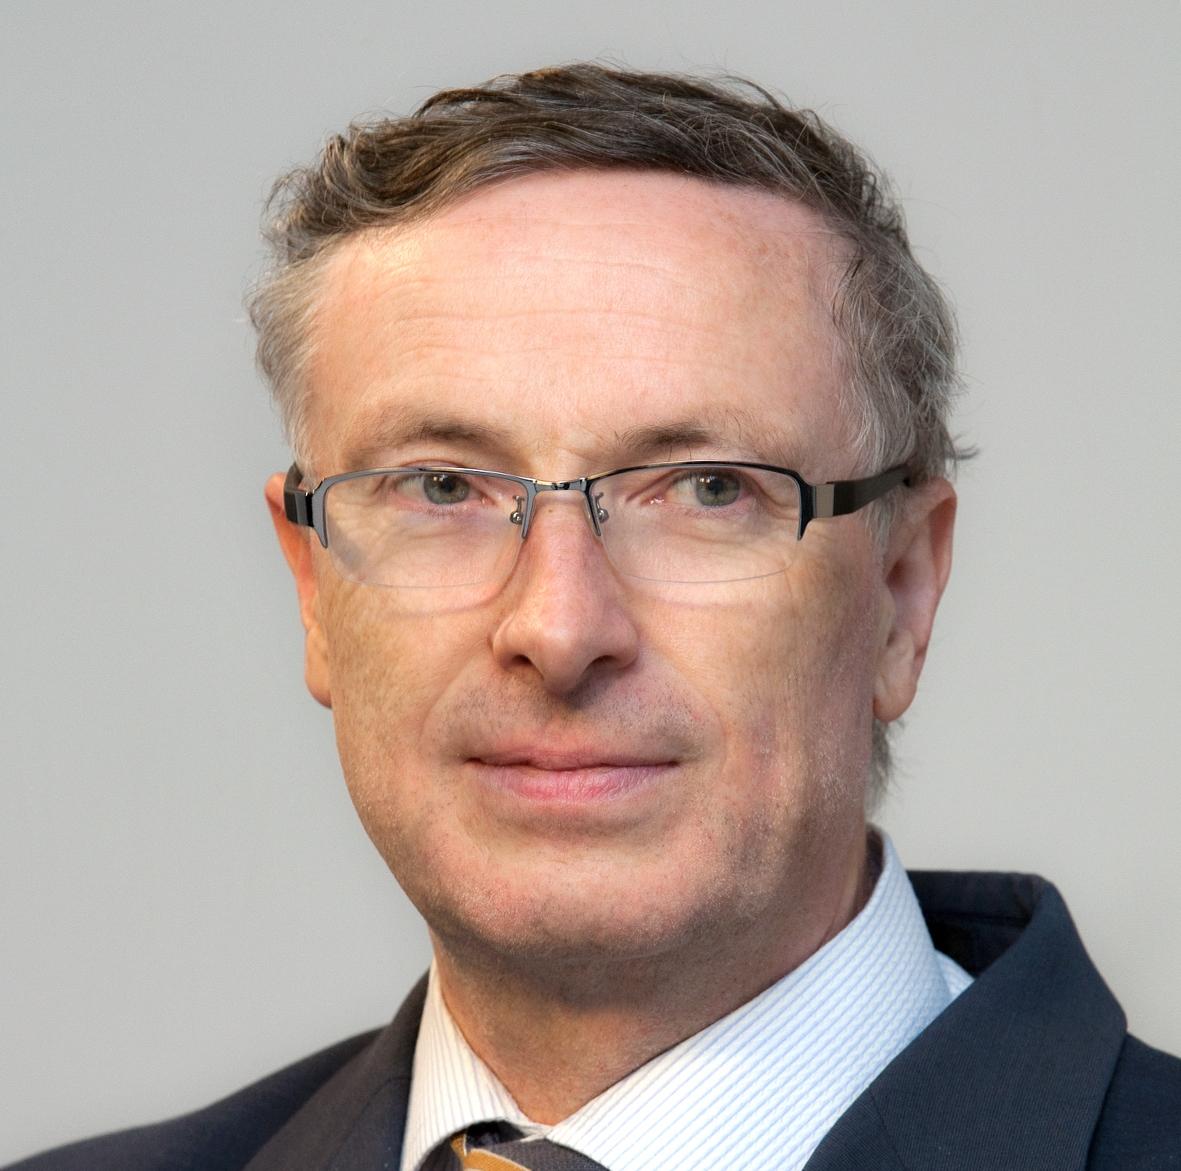 Dr. Florent Frederix